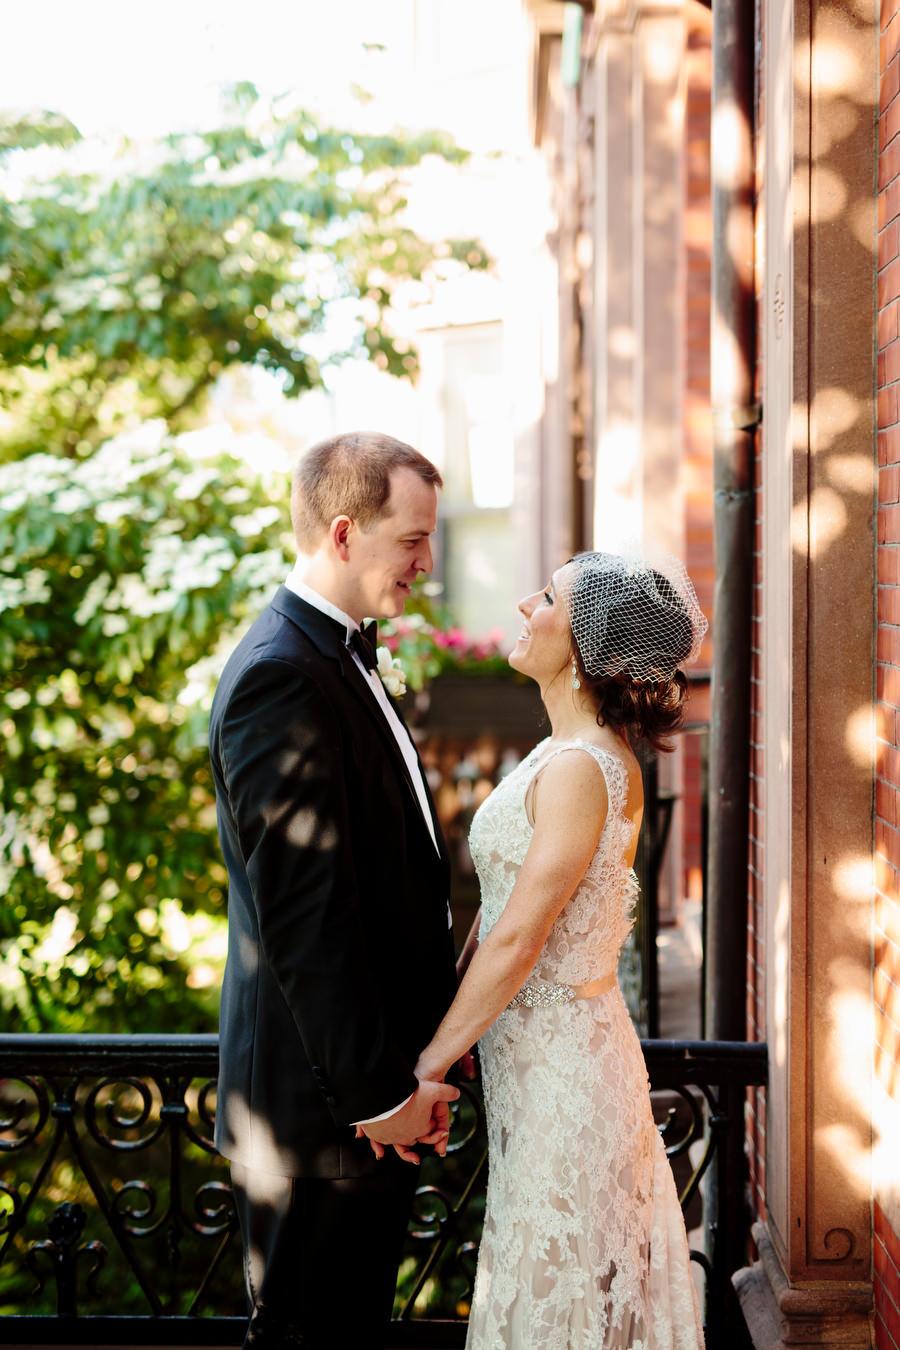 Chilton-club-wedding-boston-135.JPG